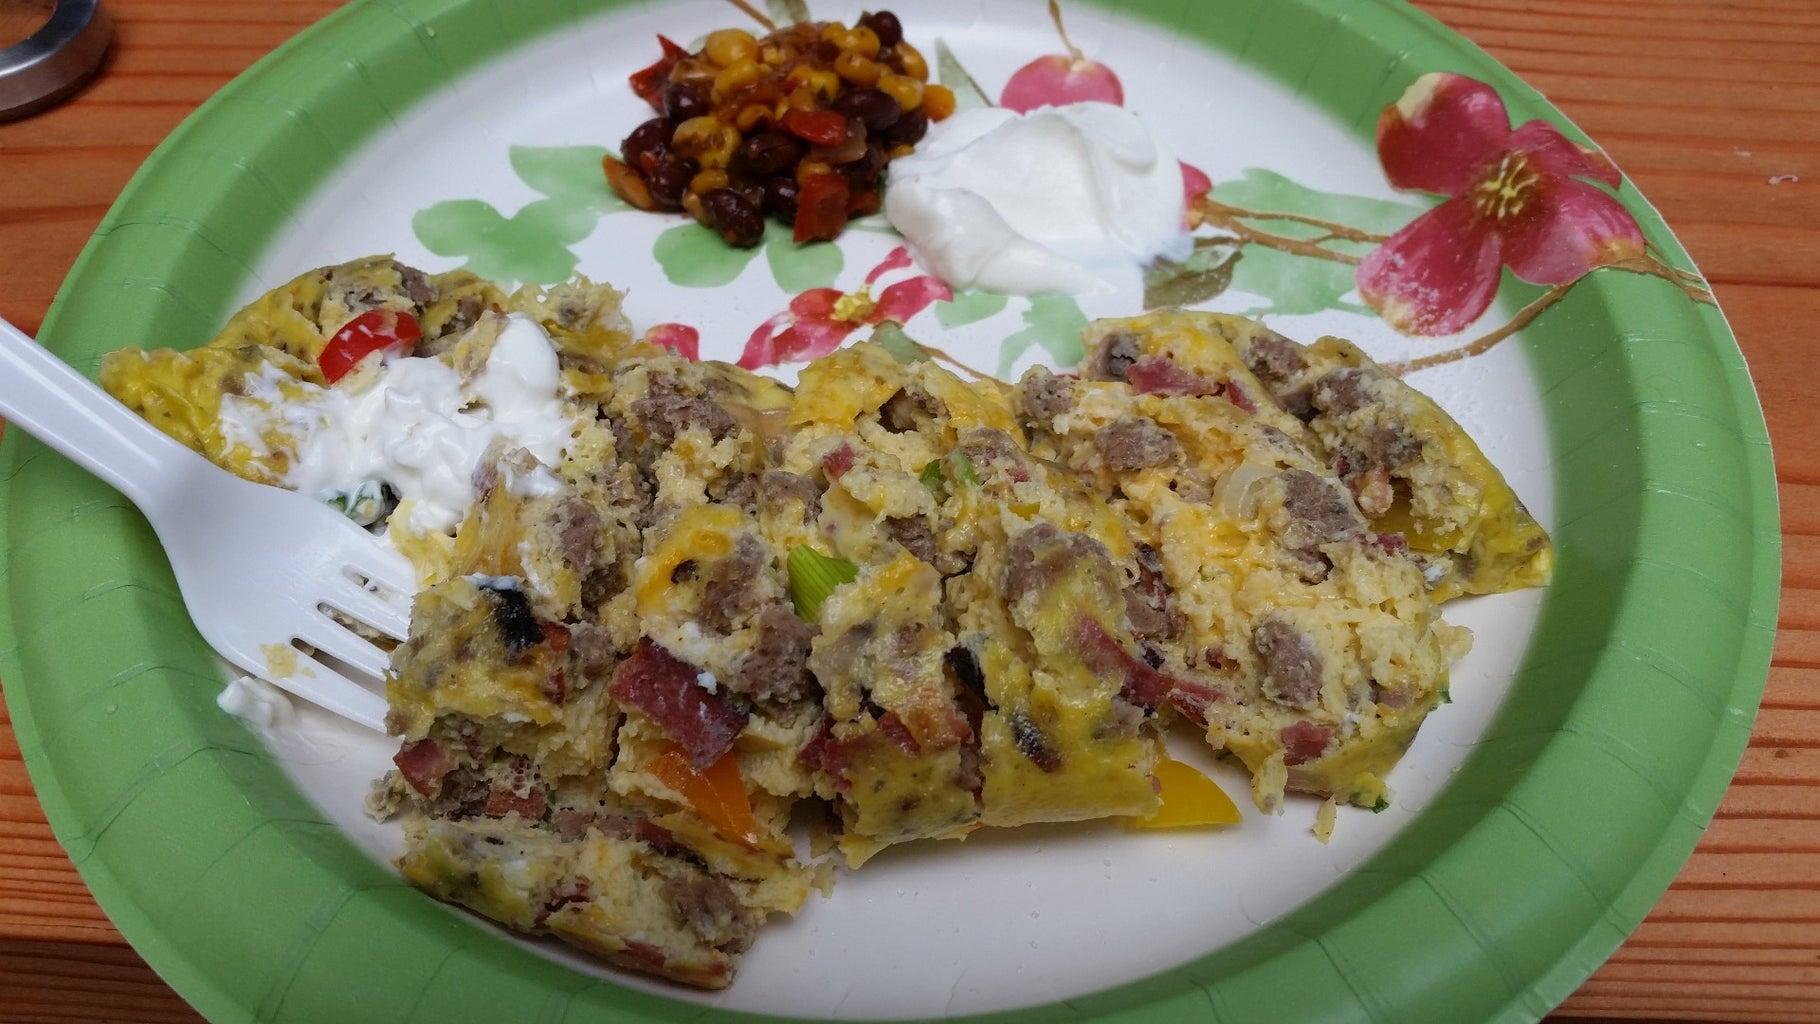 Omelette Sou Vide ...... A.K.A. Camping Bag Omelets